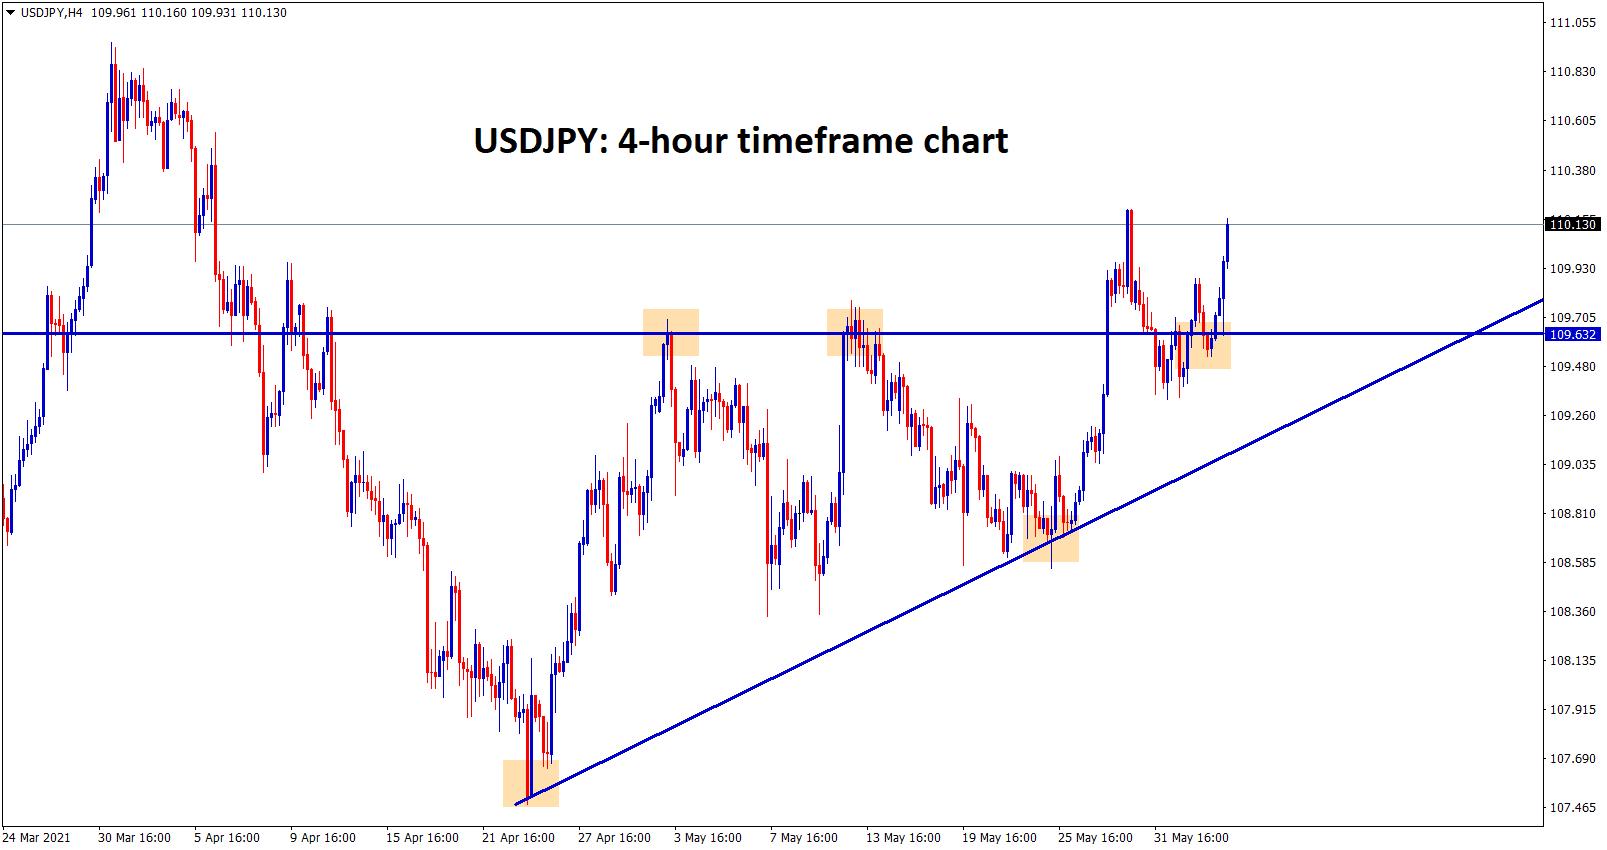 USDJPY bounces back after retesting the broken ascending Triangle